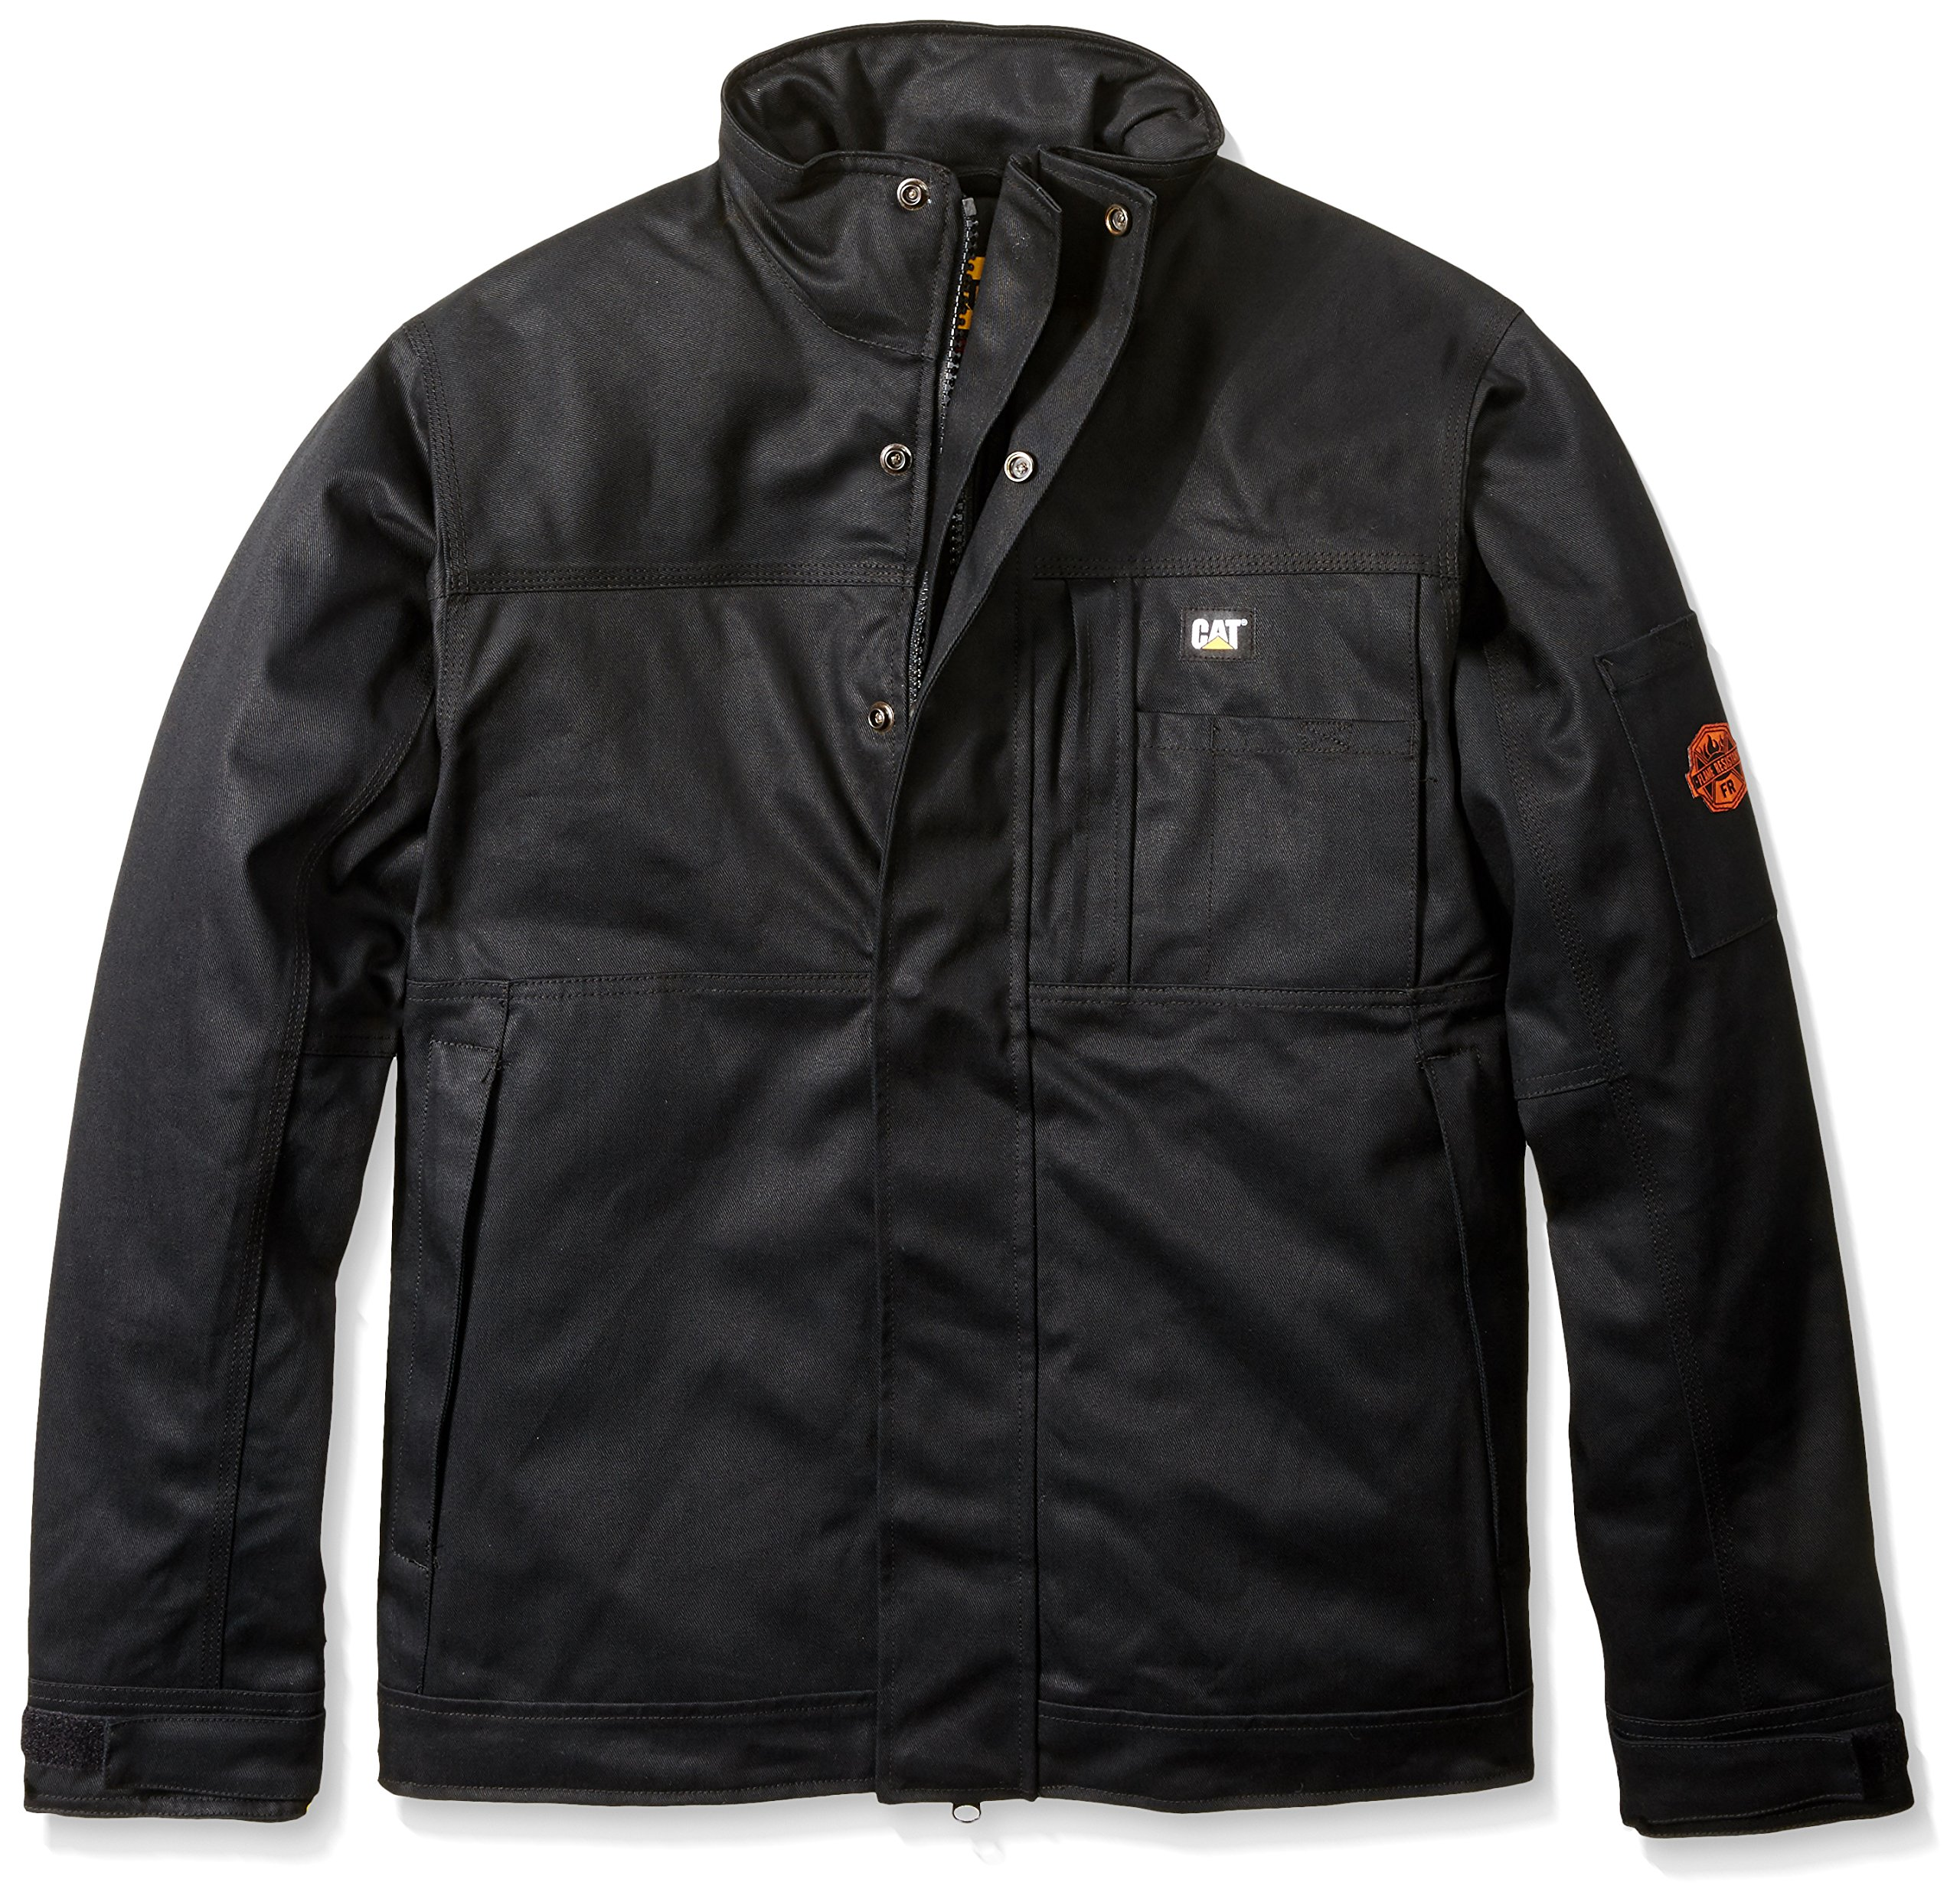 Caterpillar Men's Flame Resistant Insulated Jacket, Flame Resistant Black, X-Large by Caterpillar